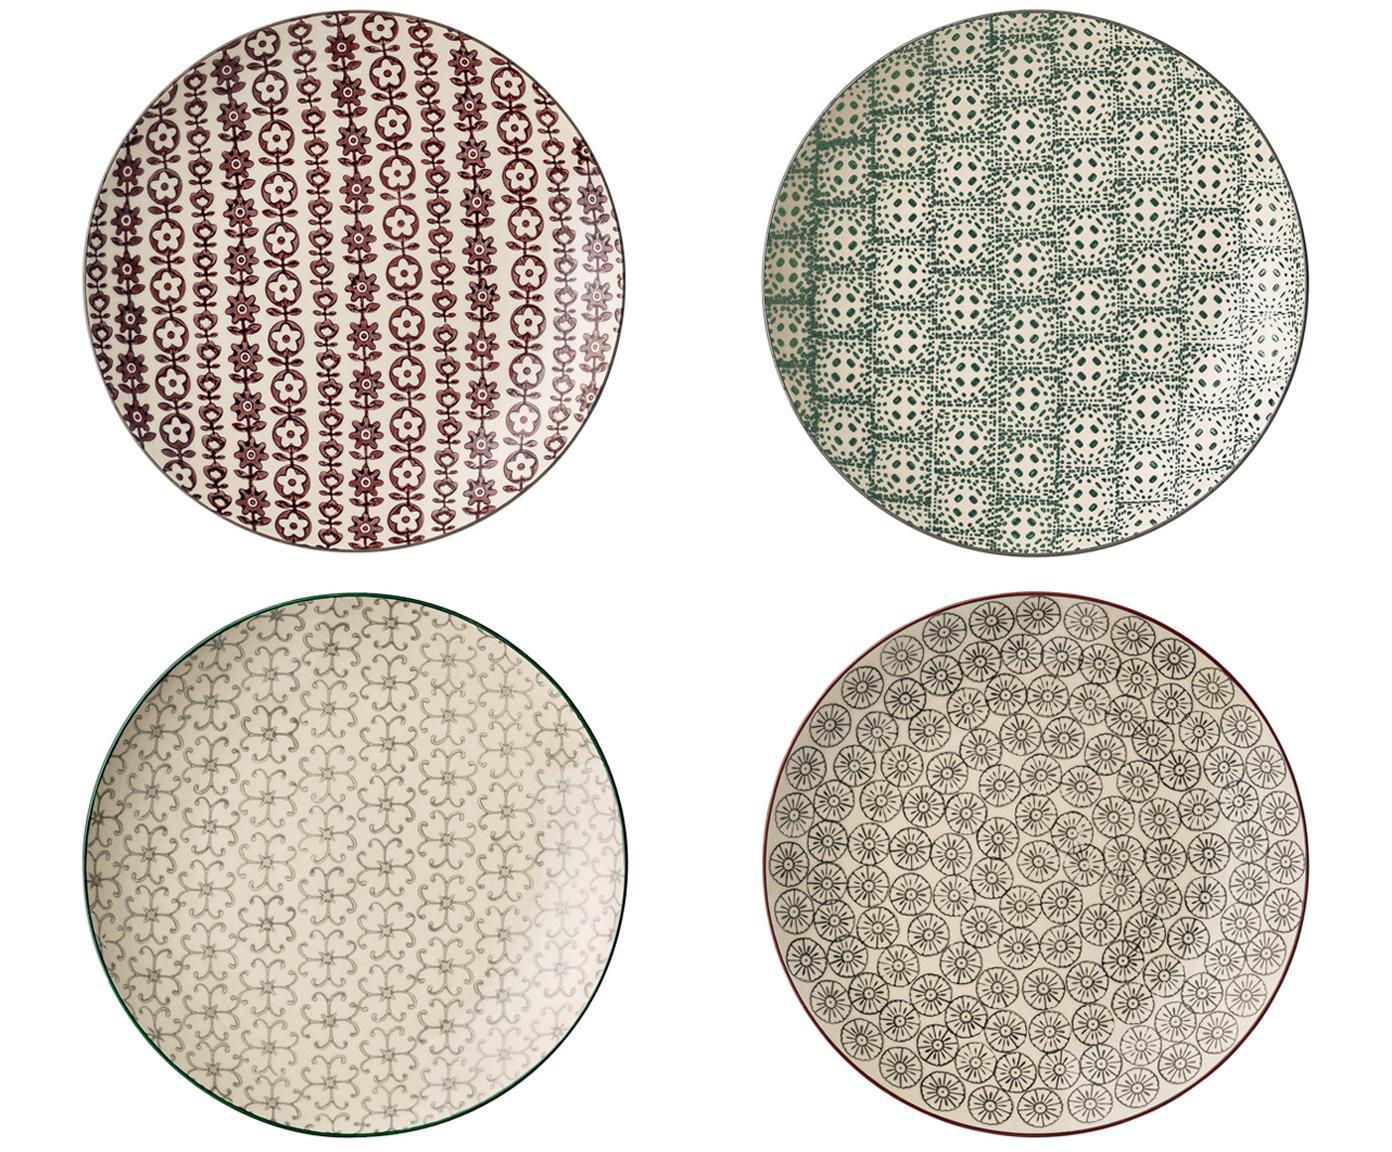 Set de platos postre Julia, 4pzas., Cerámica, Multicolor, Ø 20 cm